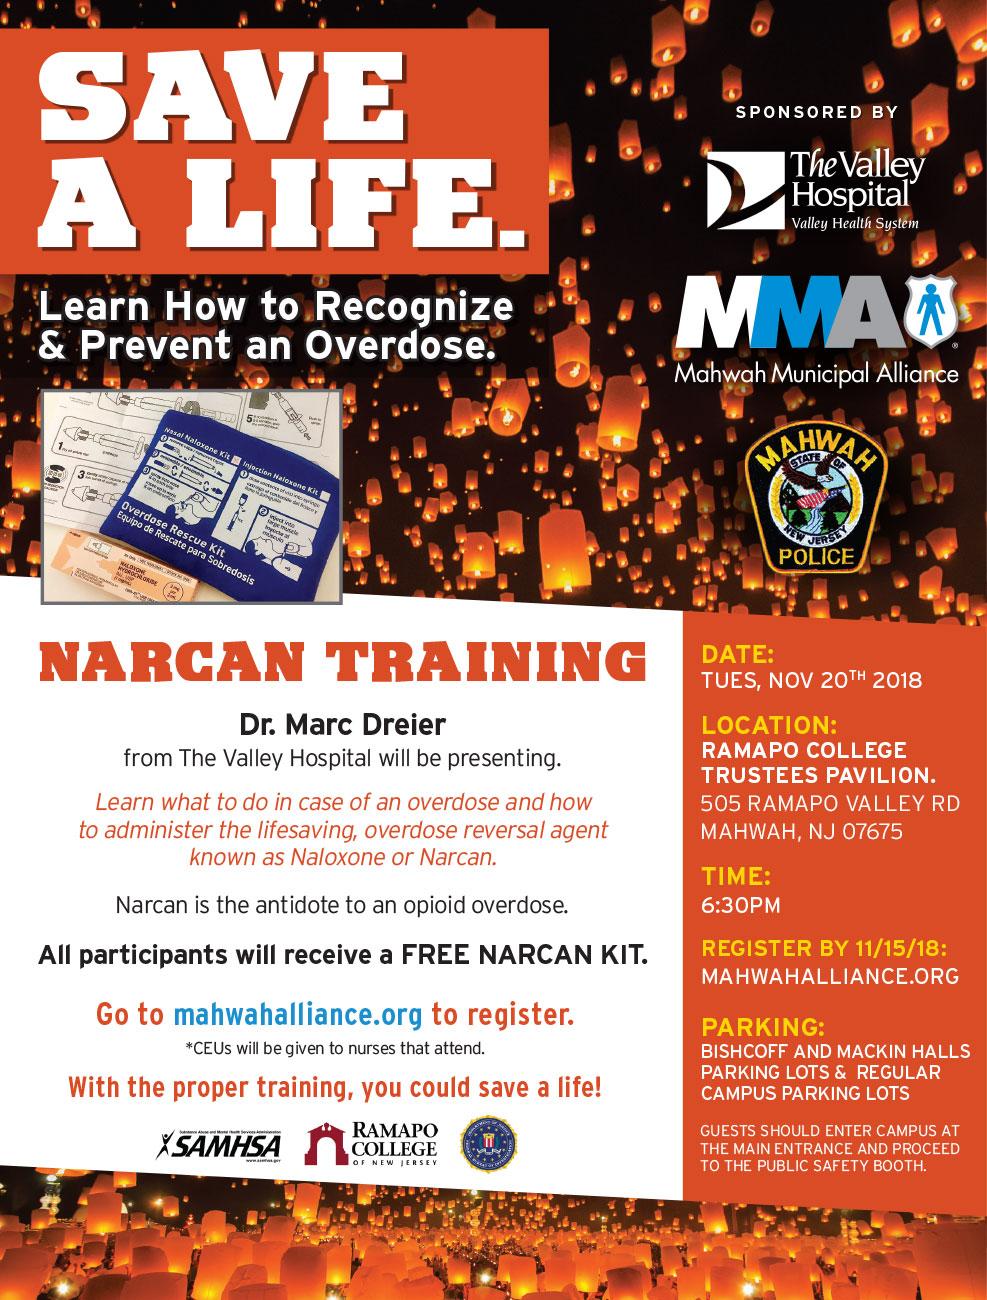 MMA-Narcan-Training-11-18.jpg